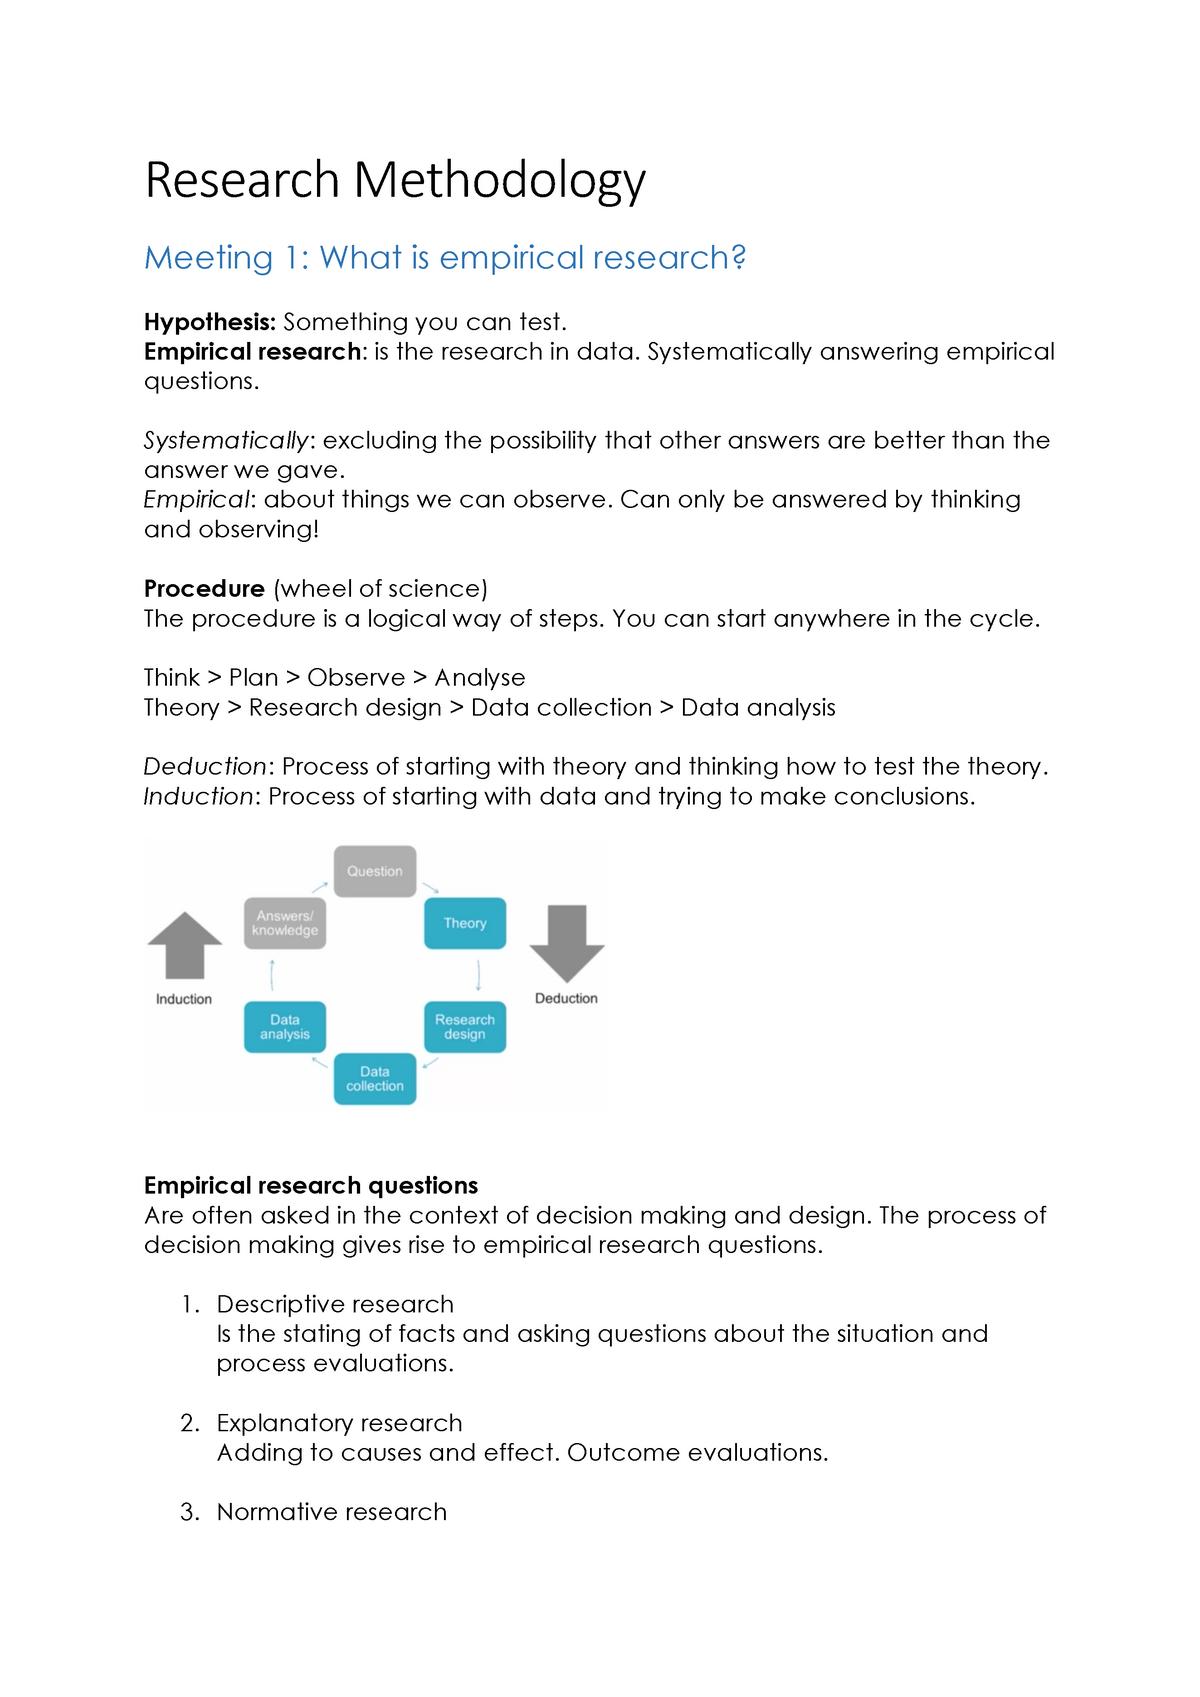 Research Methodology study notes - 201300063 - StudeerSnel